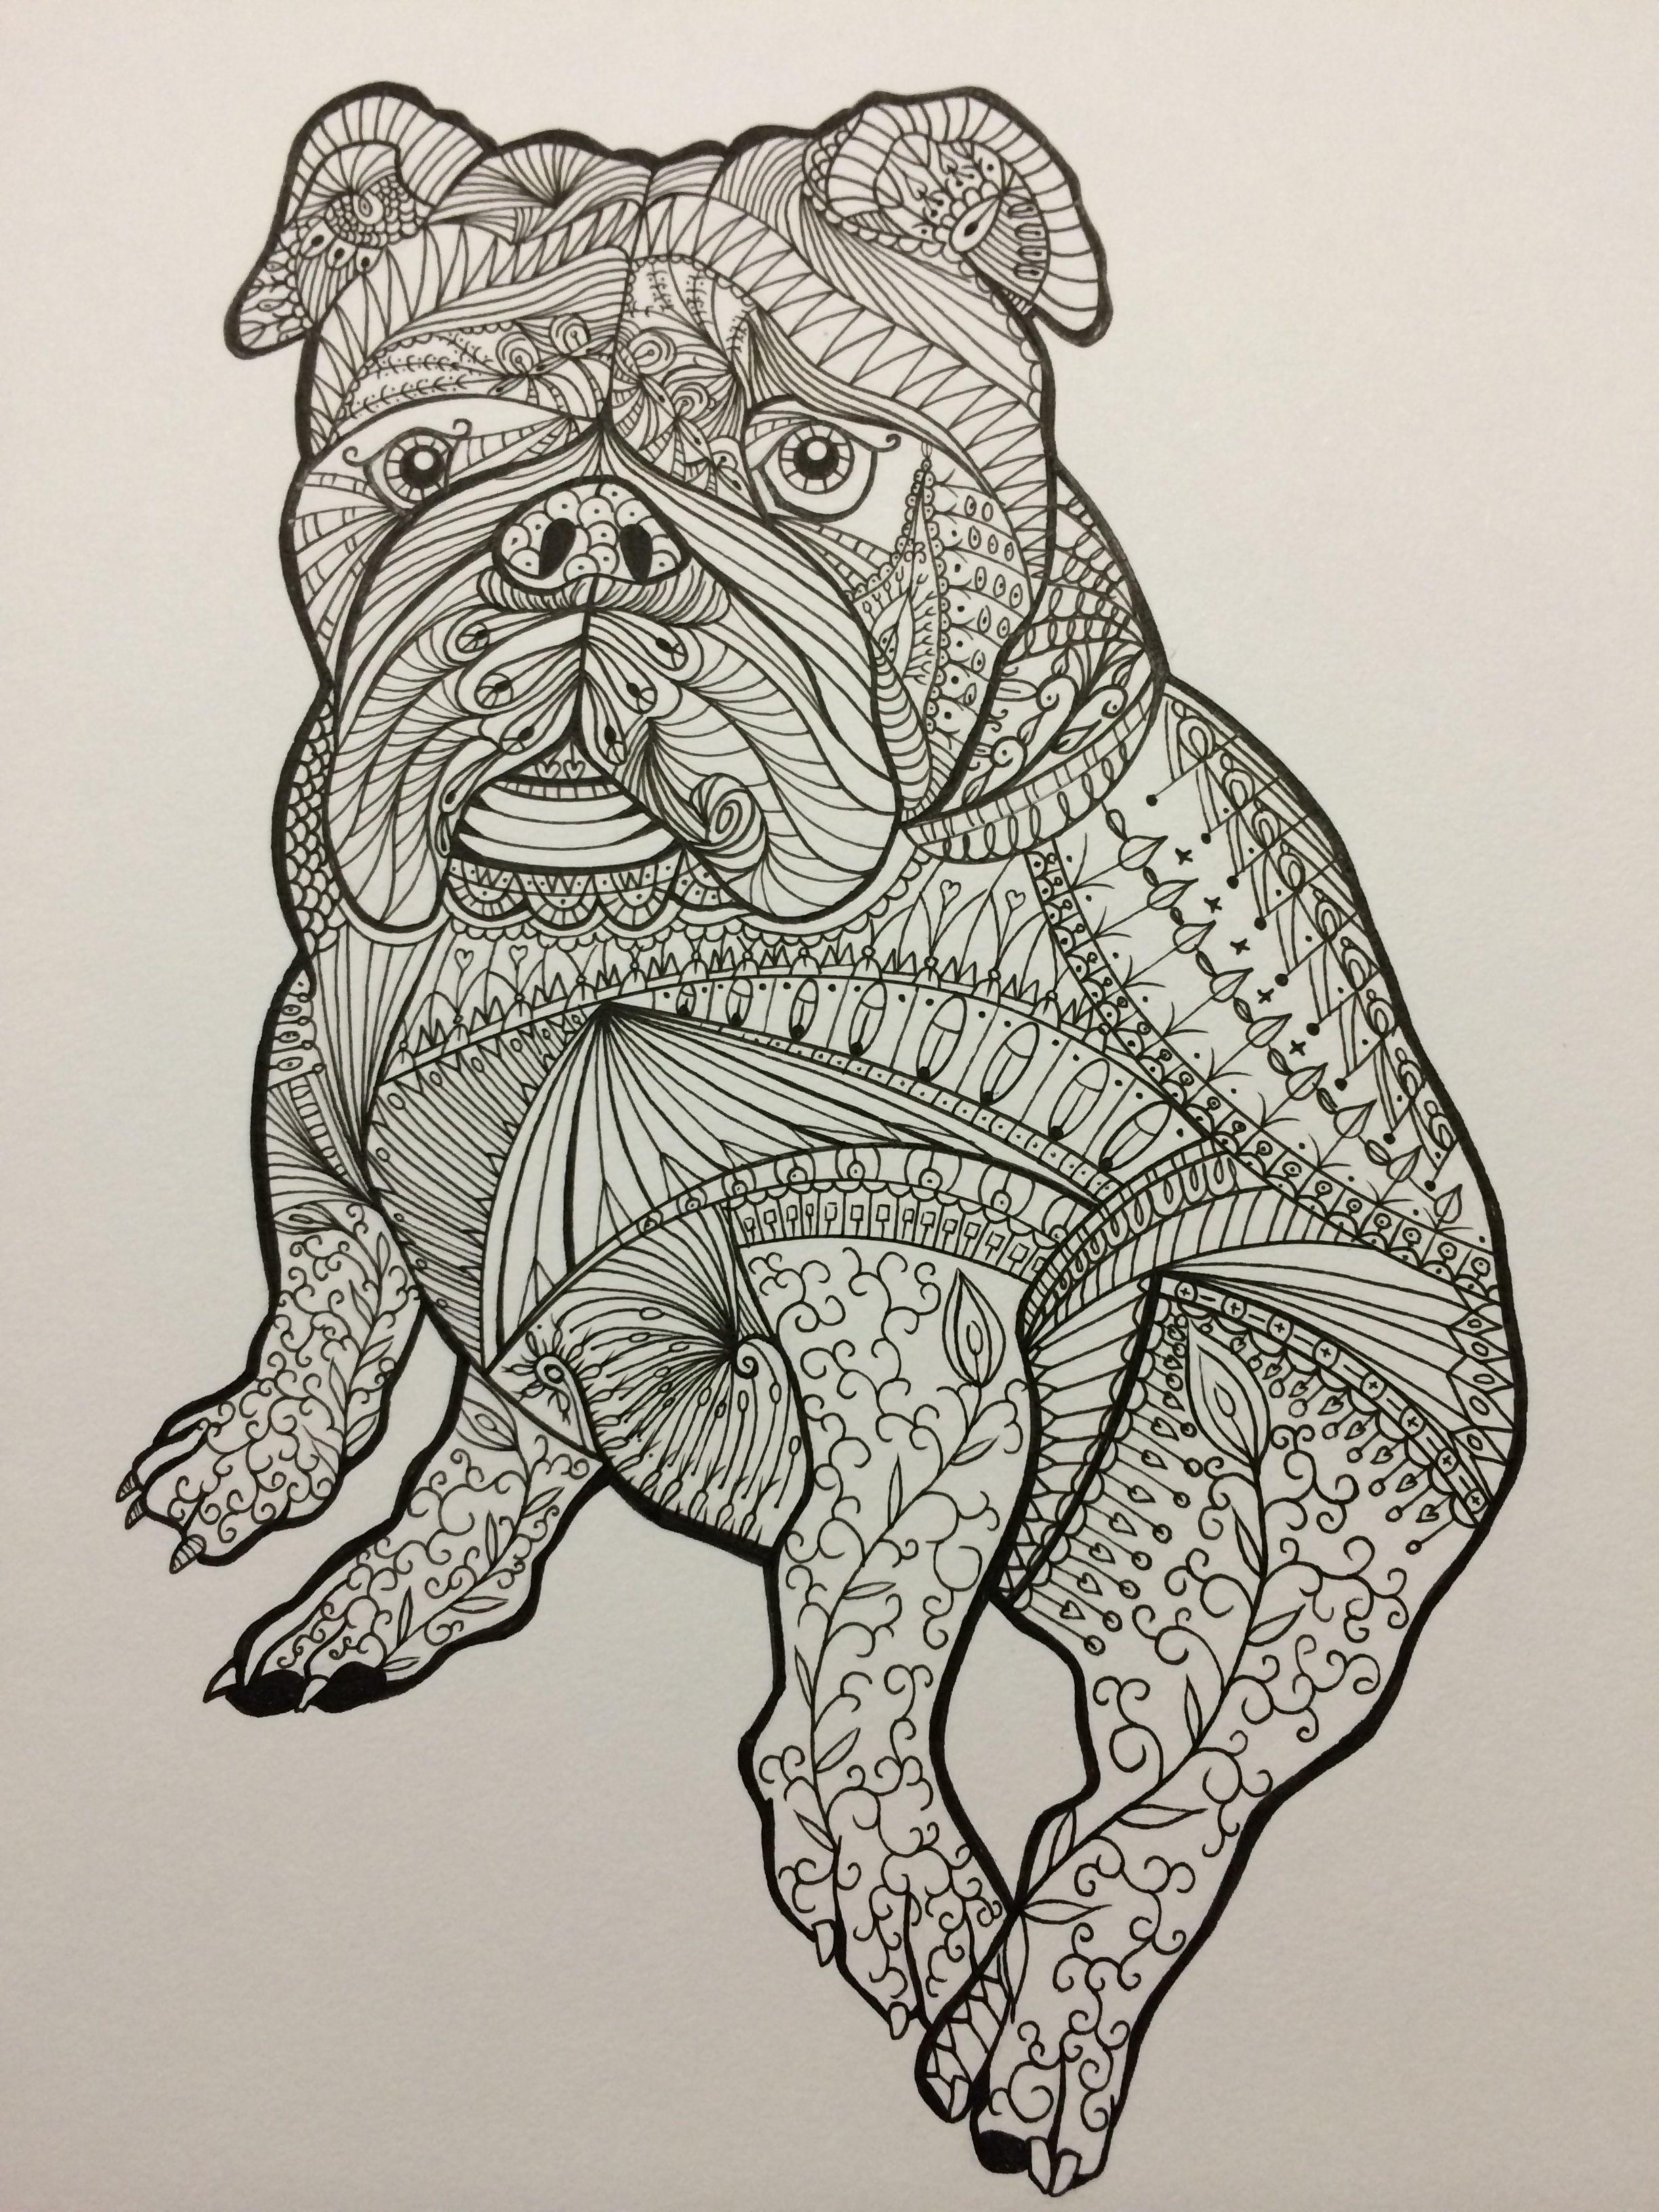 I drew this zentangle drawing of an Englishbulldog